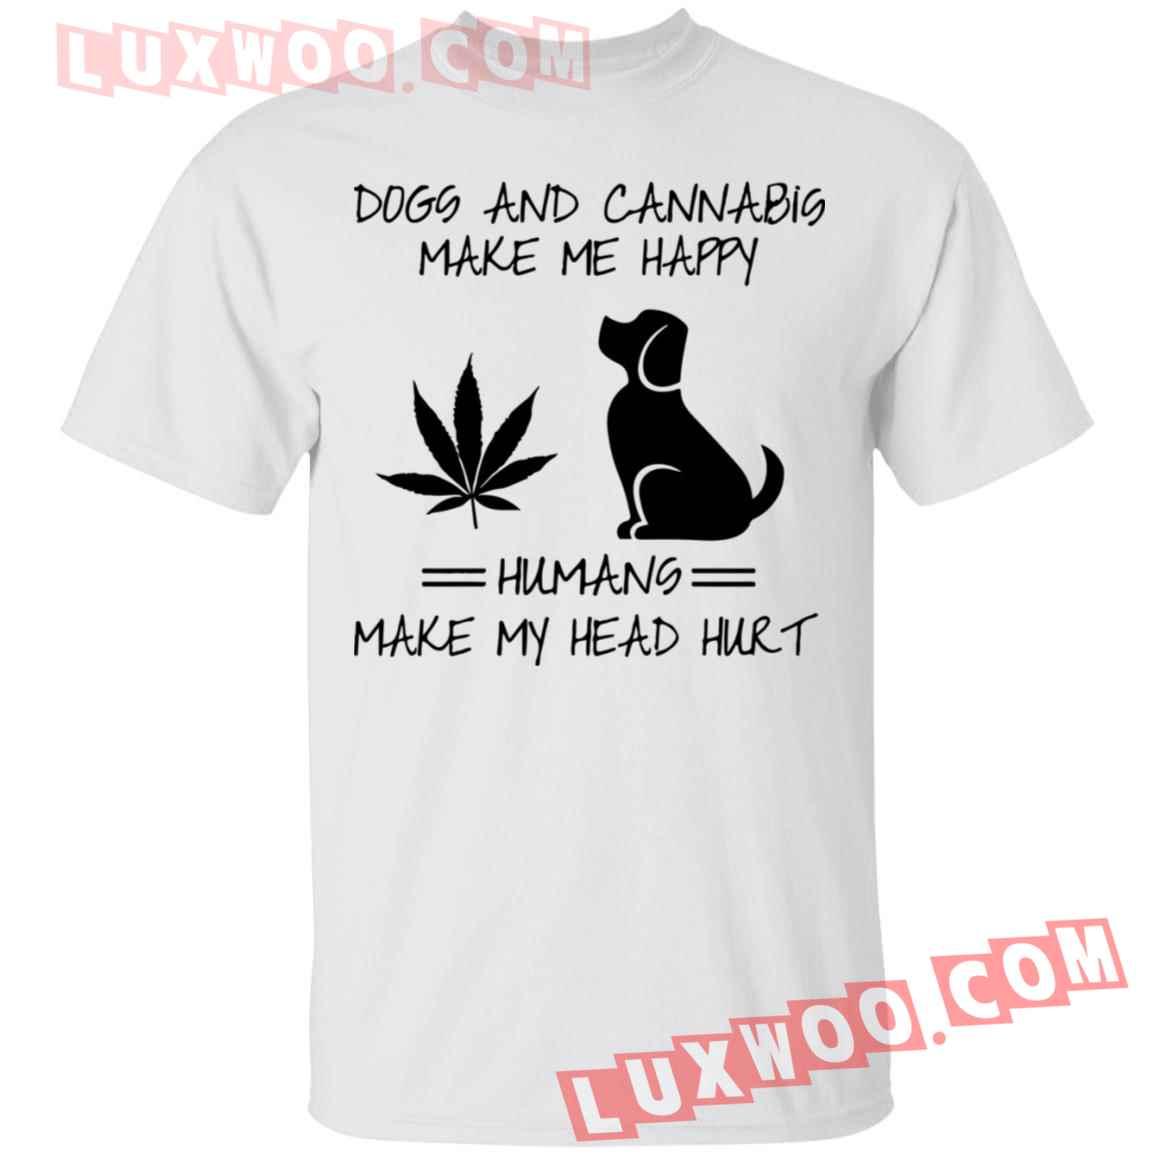 Dogs And Cannabis Make Me Happy Humans Make My Head Hurt Shirt